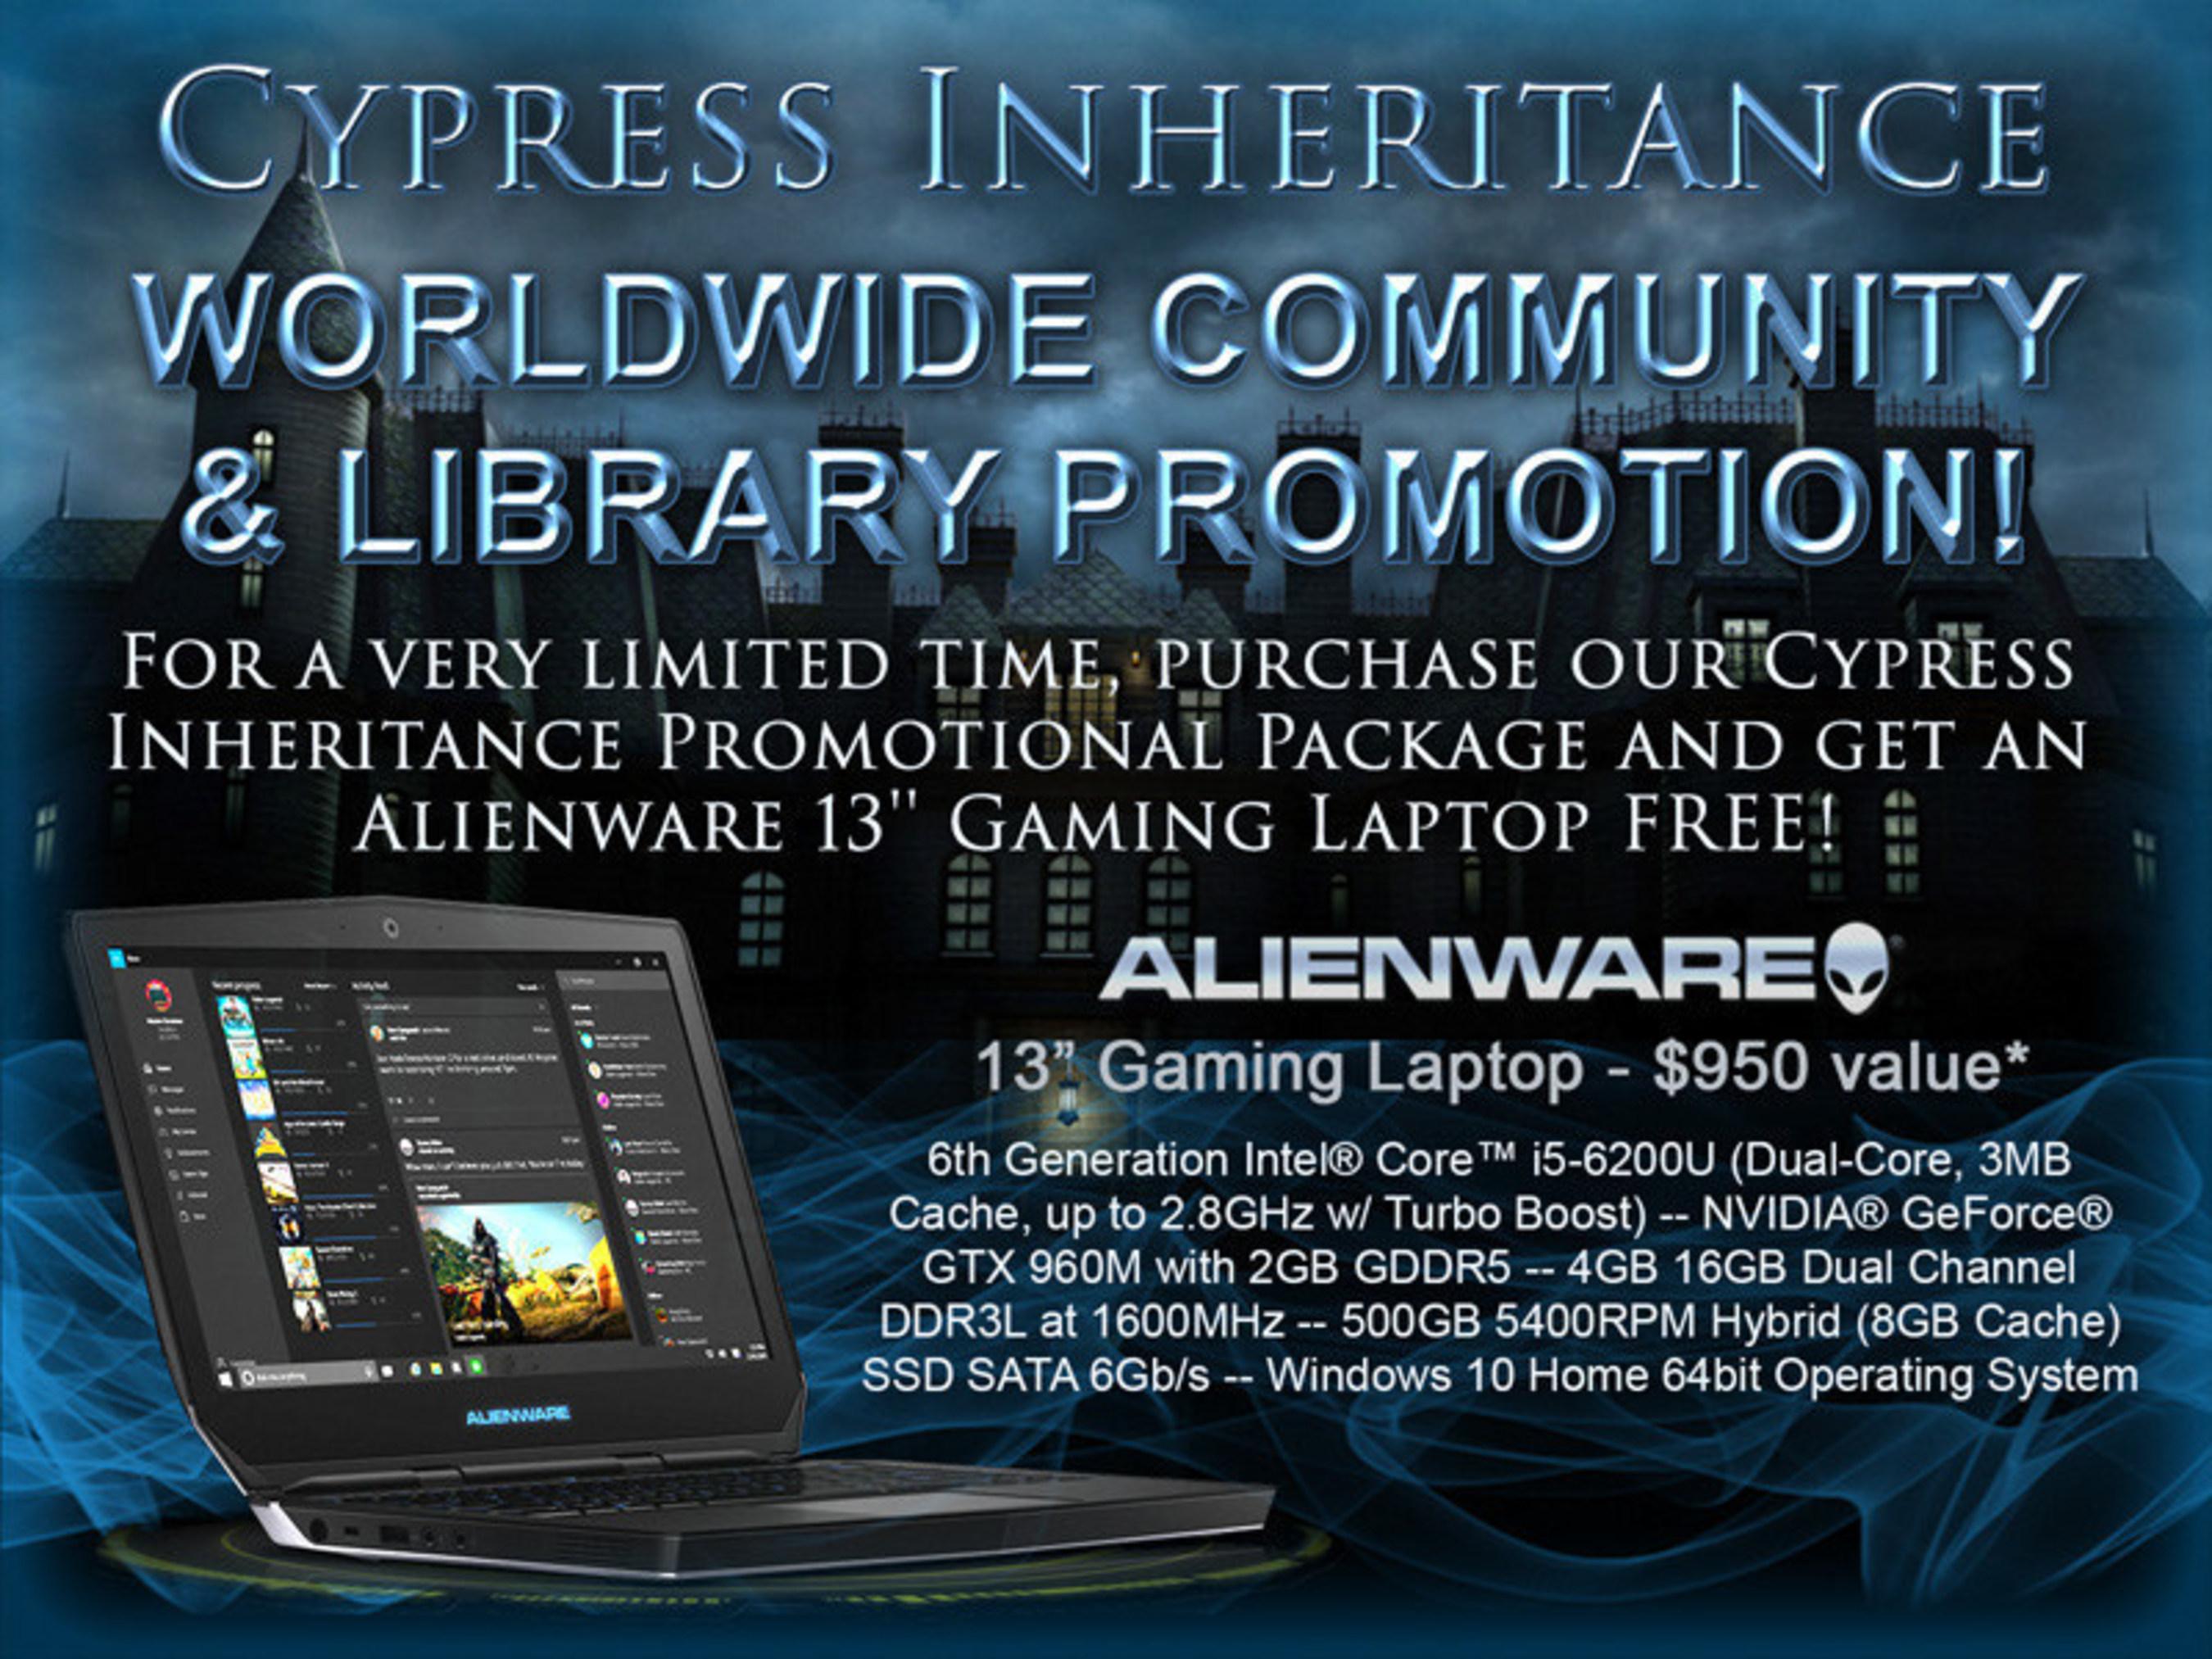 Cypress Inheritance Worldwide Community & Library Promotions